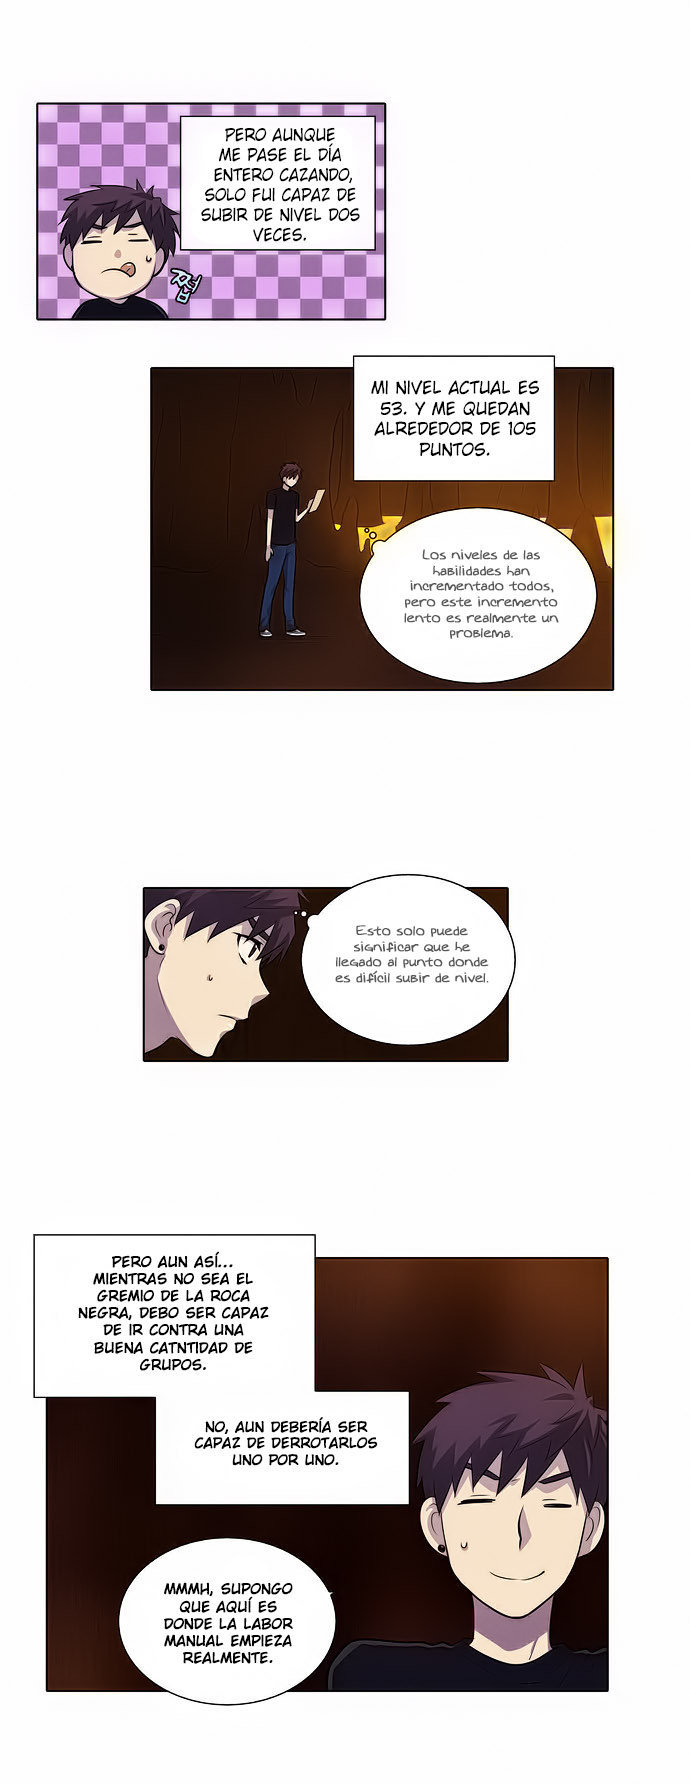 https://c5.ninemanga.com/es_manga/61/1725/439977/703aea31975f2fa45fdb3e4a8e378ad1.jpg Page 3